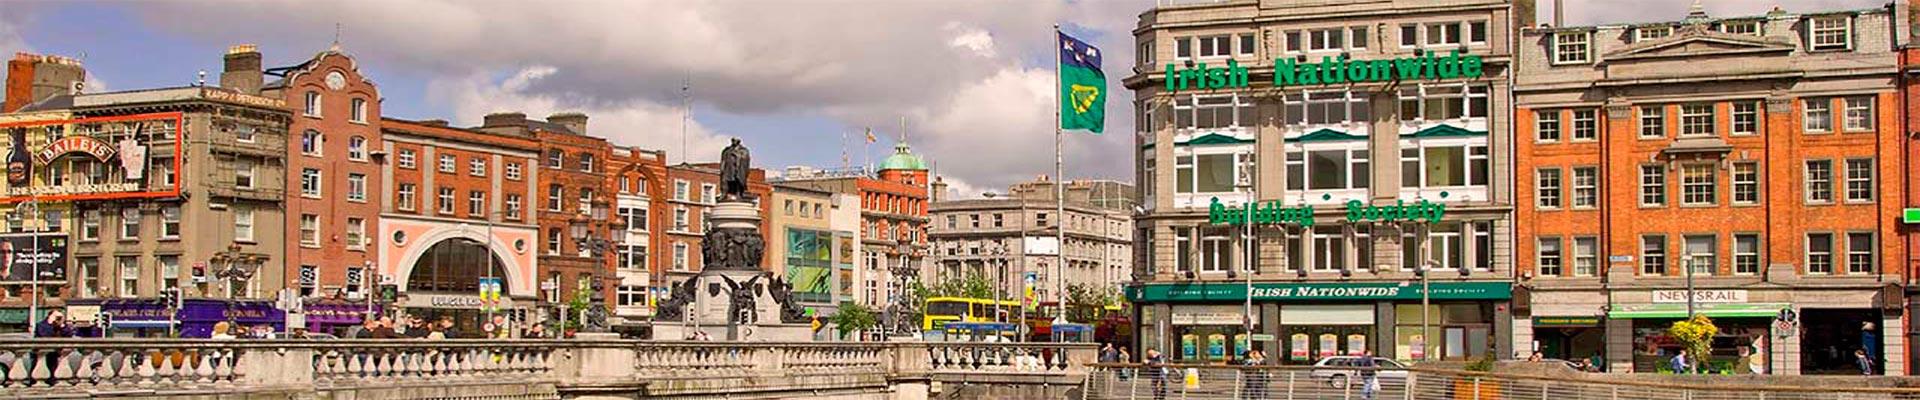 Dublim, Irlanda